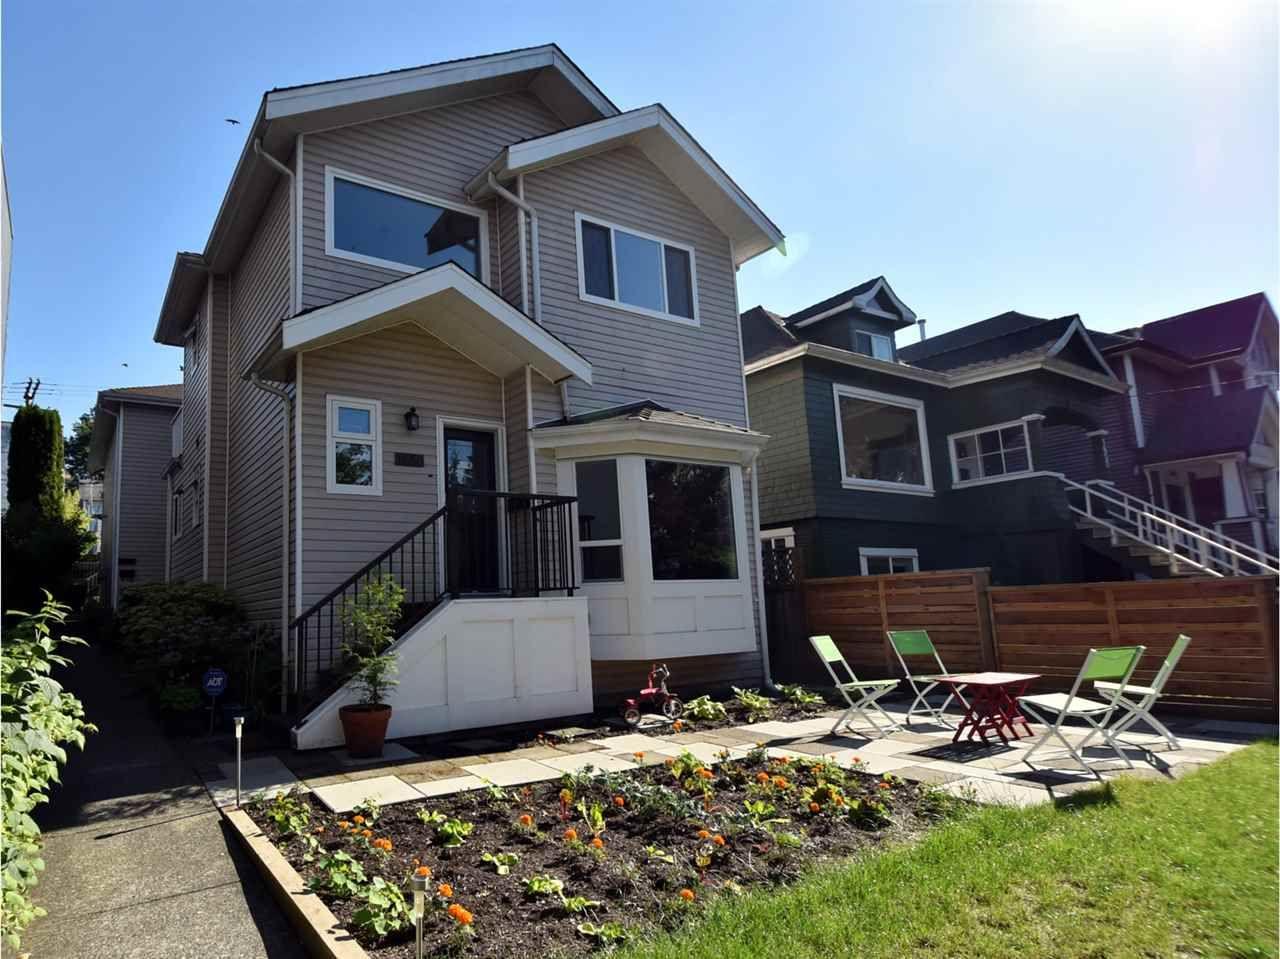 Main Photo: 1656 E 13TH Avenue in Vancouver: Grandview VE 1/2 Duplex for sale (Vancouver East)  : MLS®# R2077472